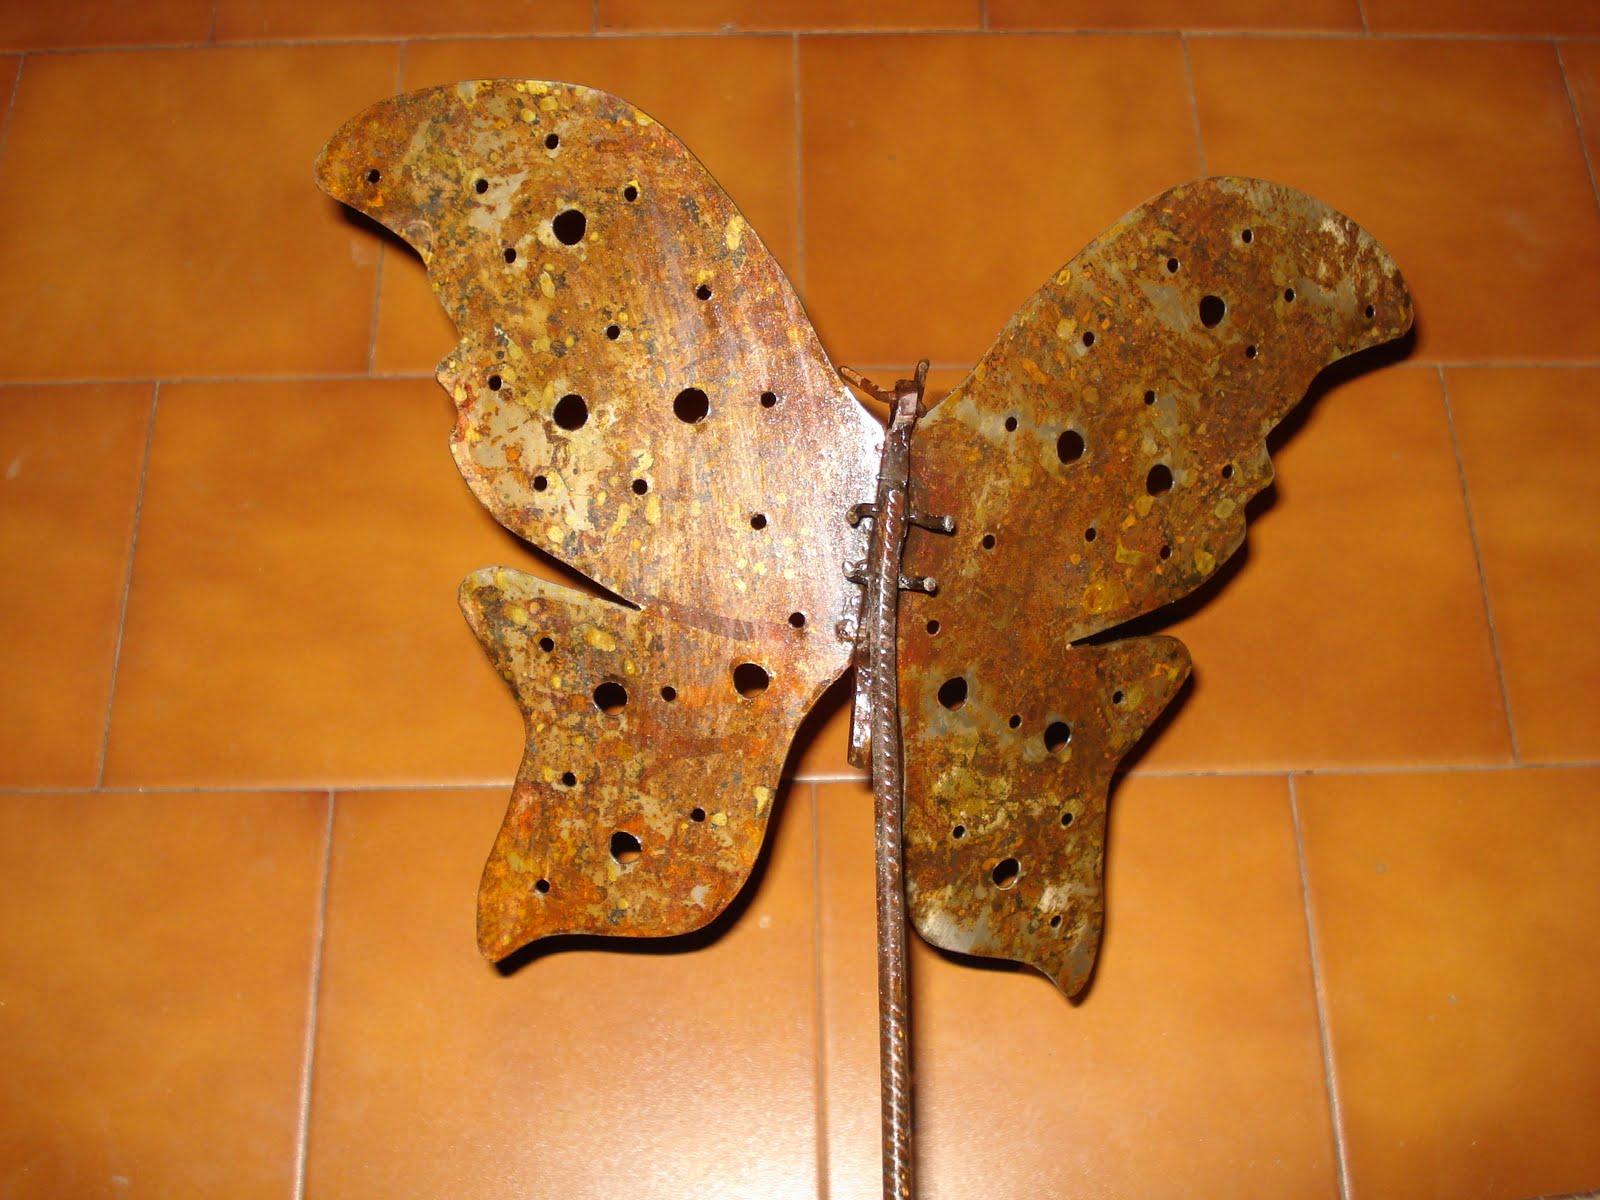 Hefesto mariposa en chapa de hierro oxidado - Chapa de hierro ...